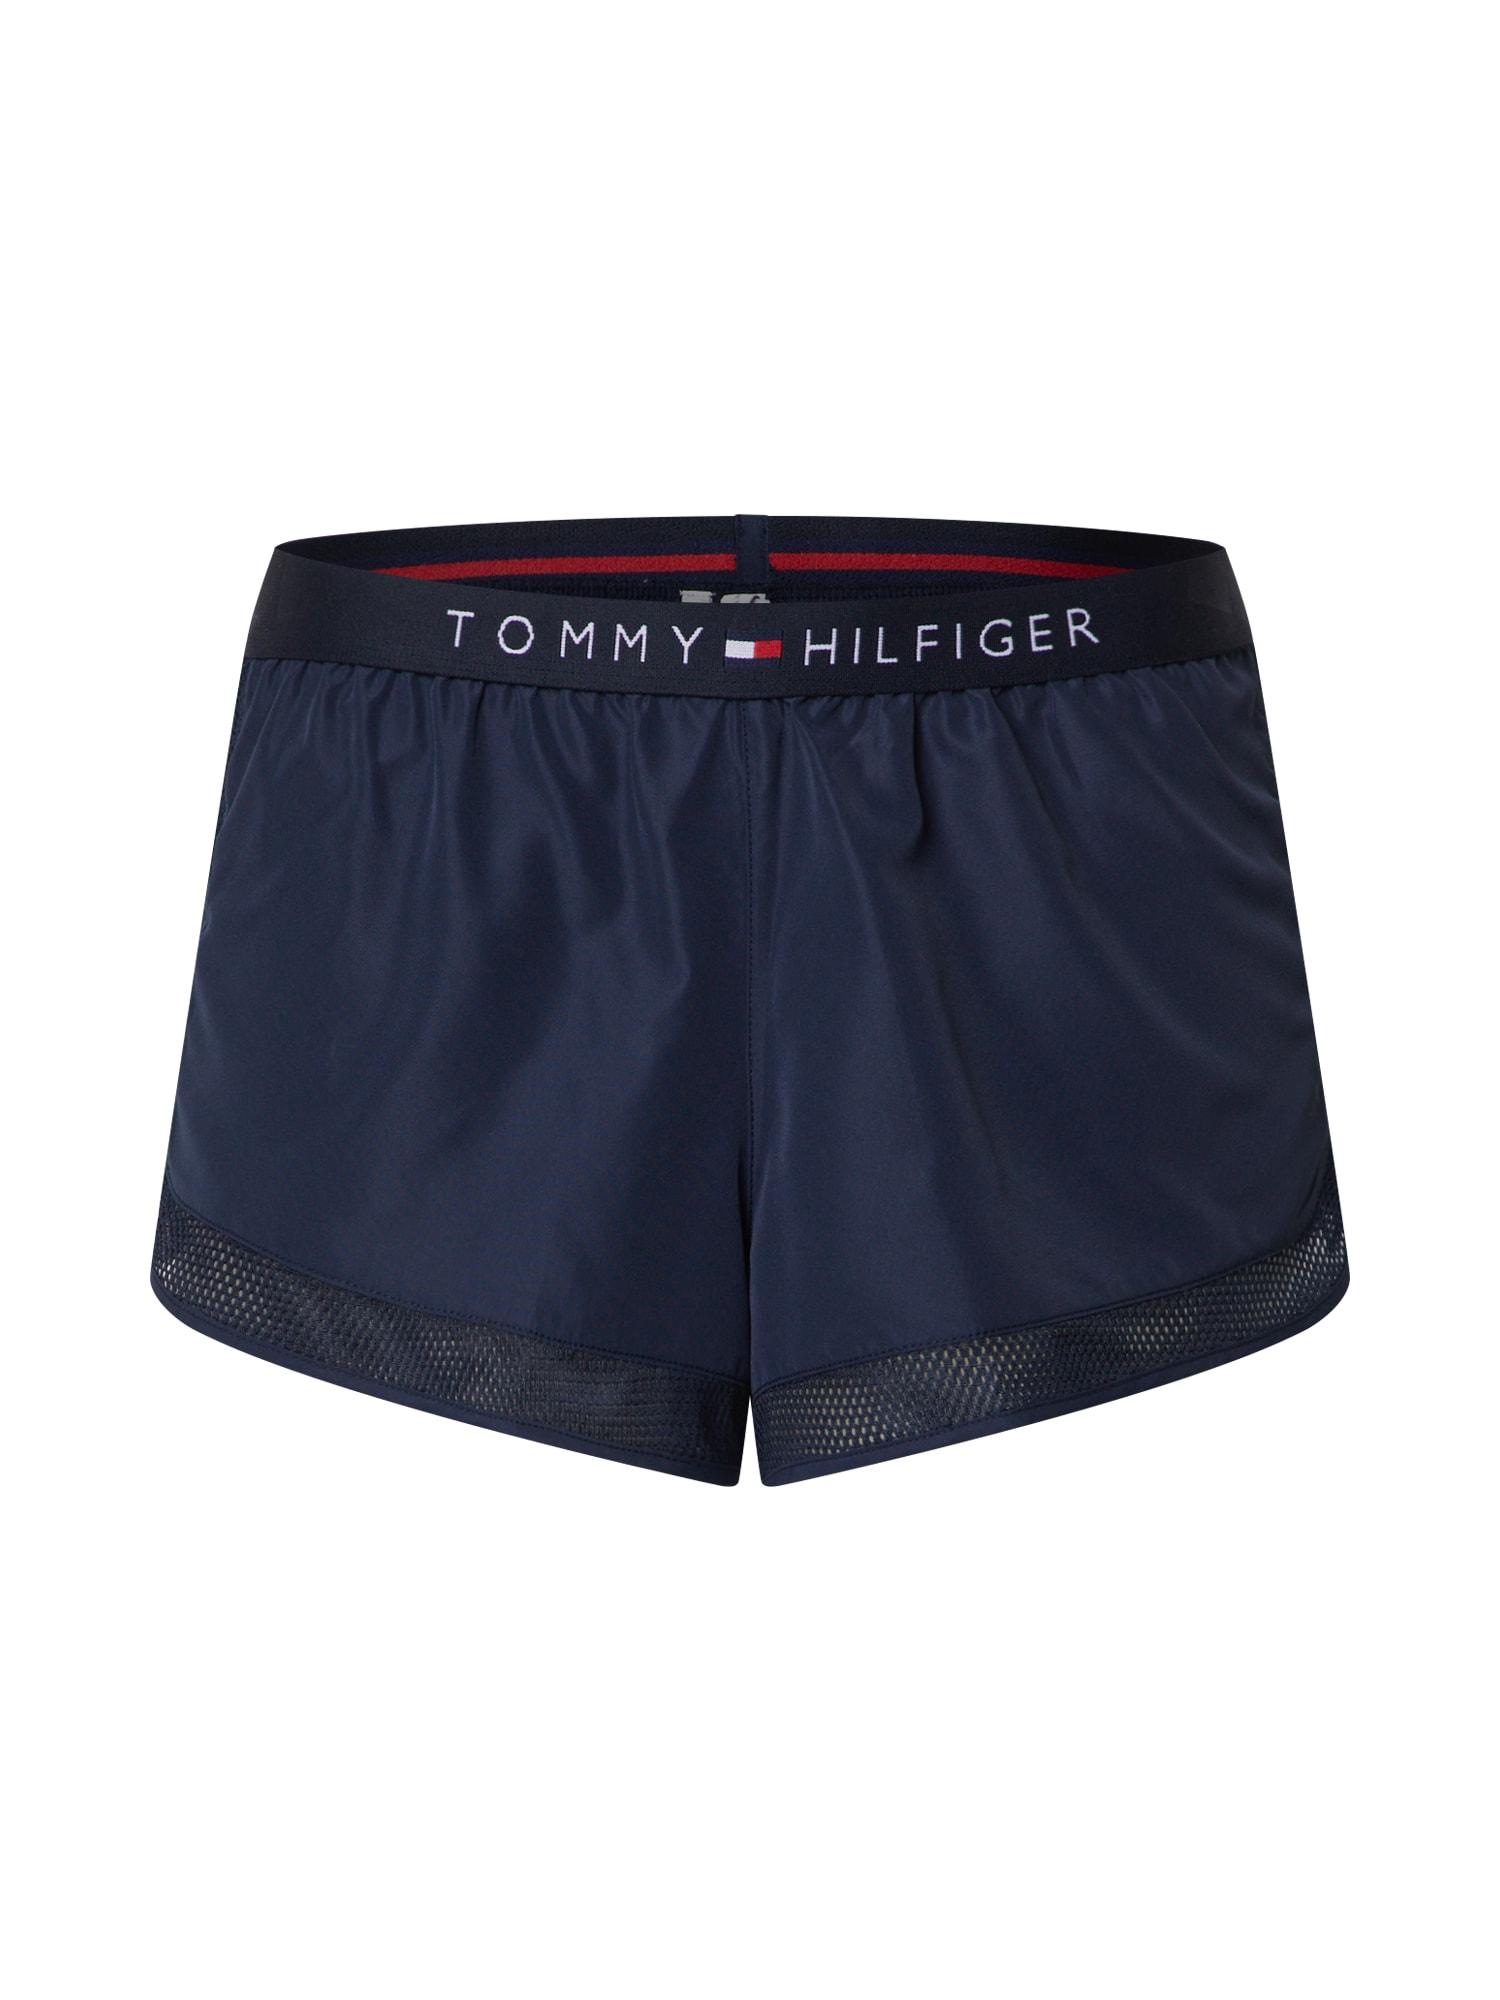 Tommy Hilfiger Underwear Pižaminės kelnės 'LIGHTWEIGHT RUNNER' mėlyna